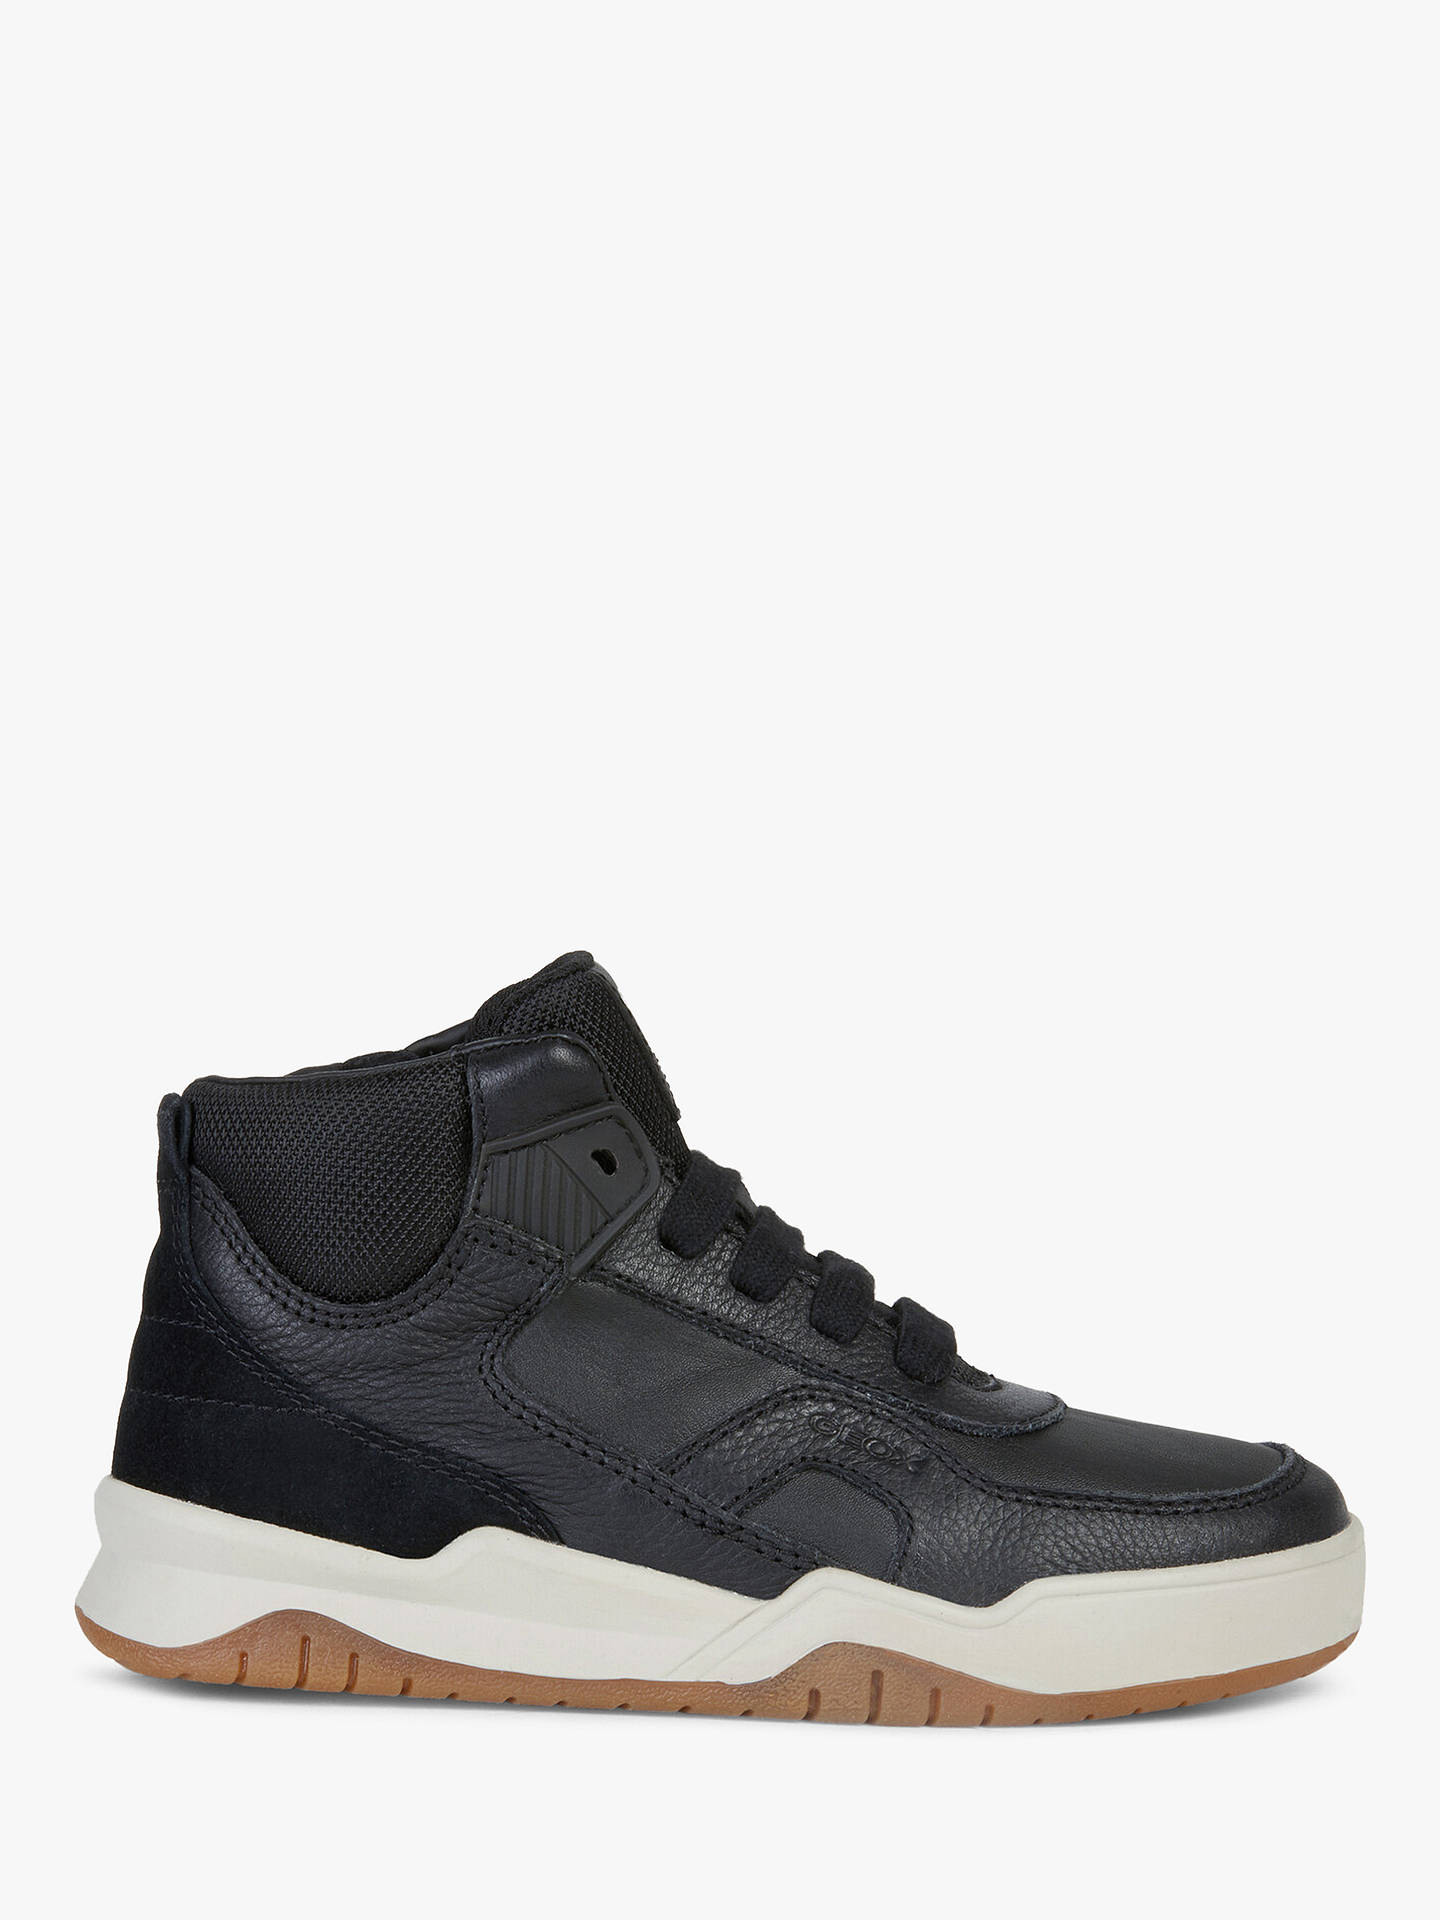 best authentic c819e e9634 Geox Children's Perth Shoes, Black at John Lewis & Partners